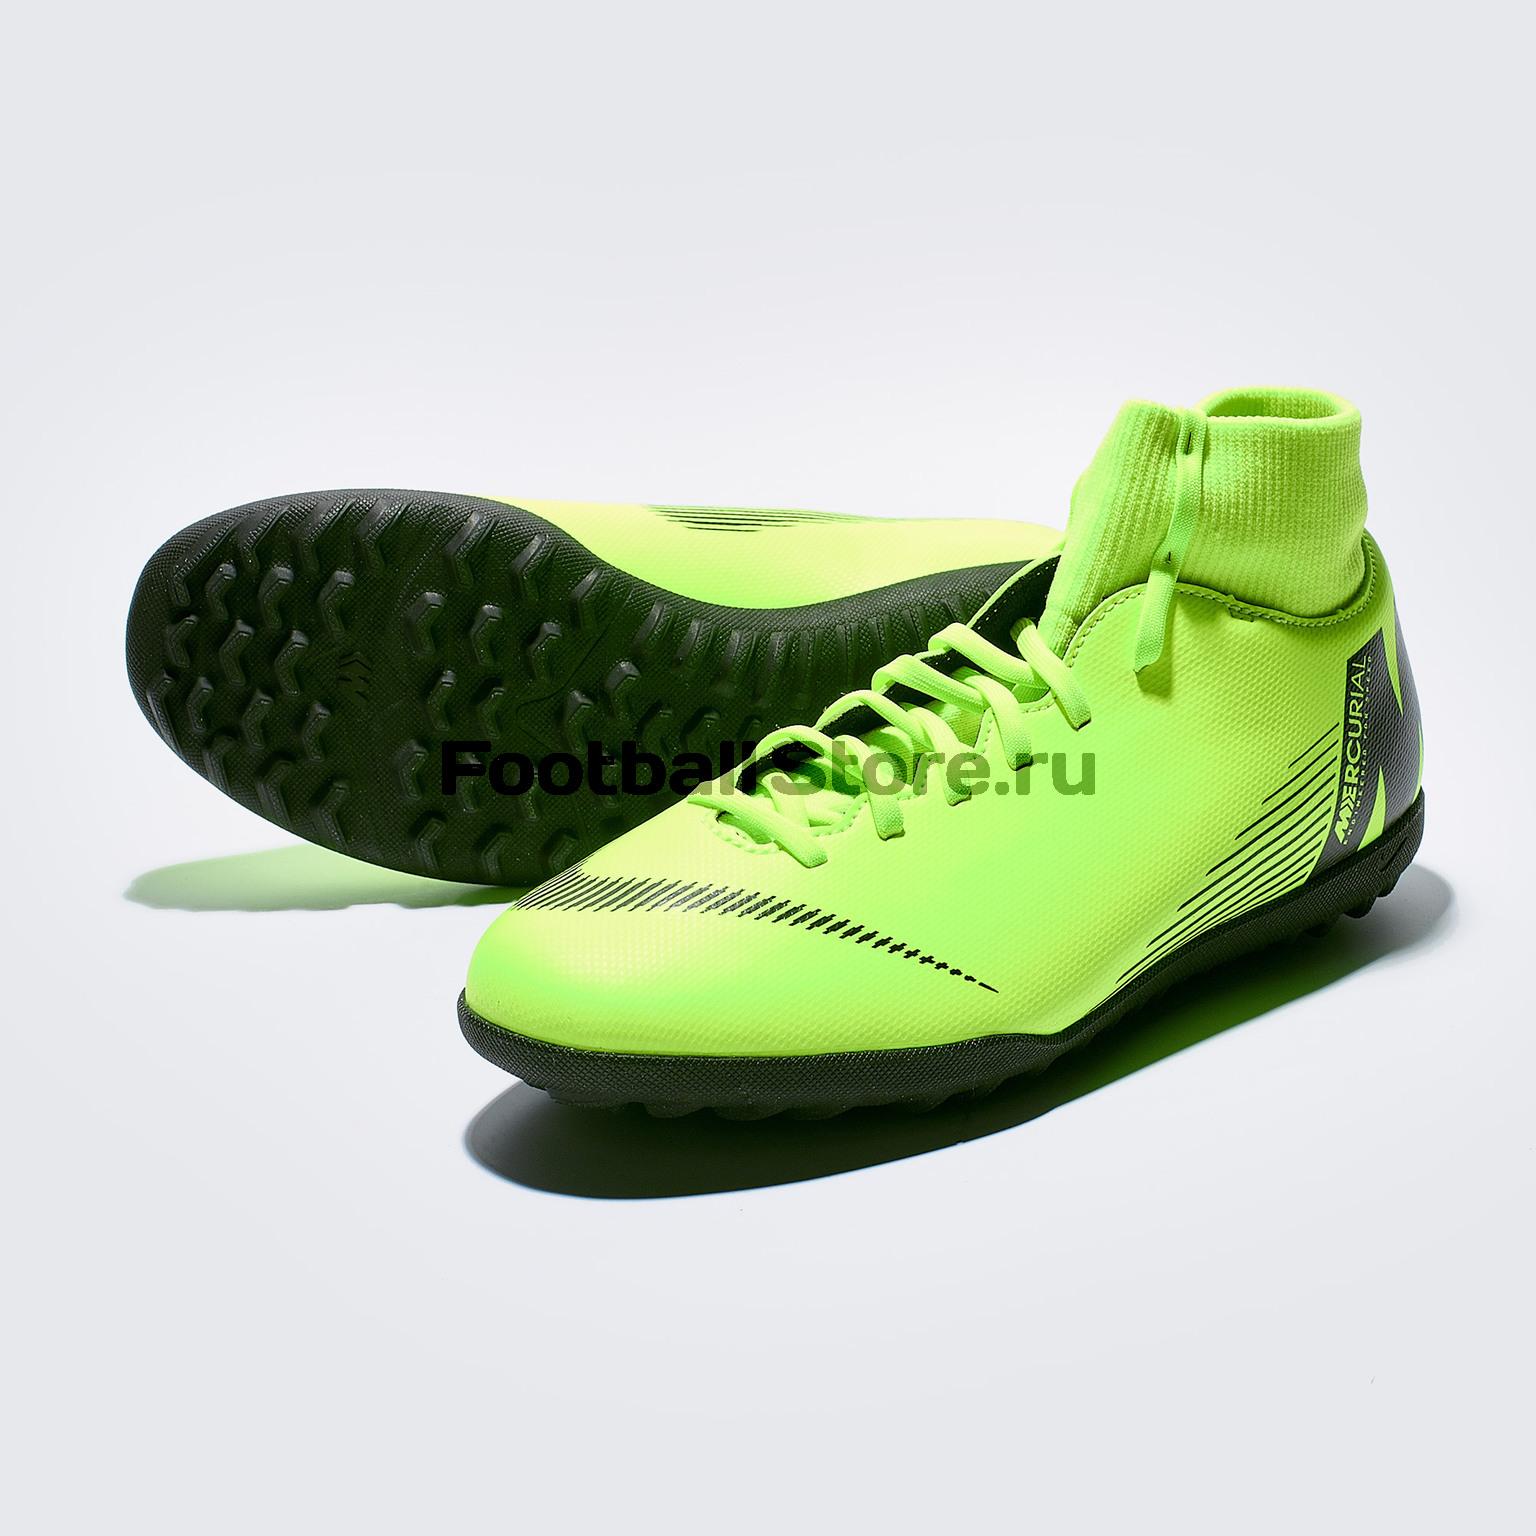 c47f86fb Шиповки Nike SuperflyX 6 Club TF AH7372-701 – купить шиповки в интернет  магазине footballstore, цена, фото